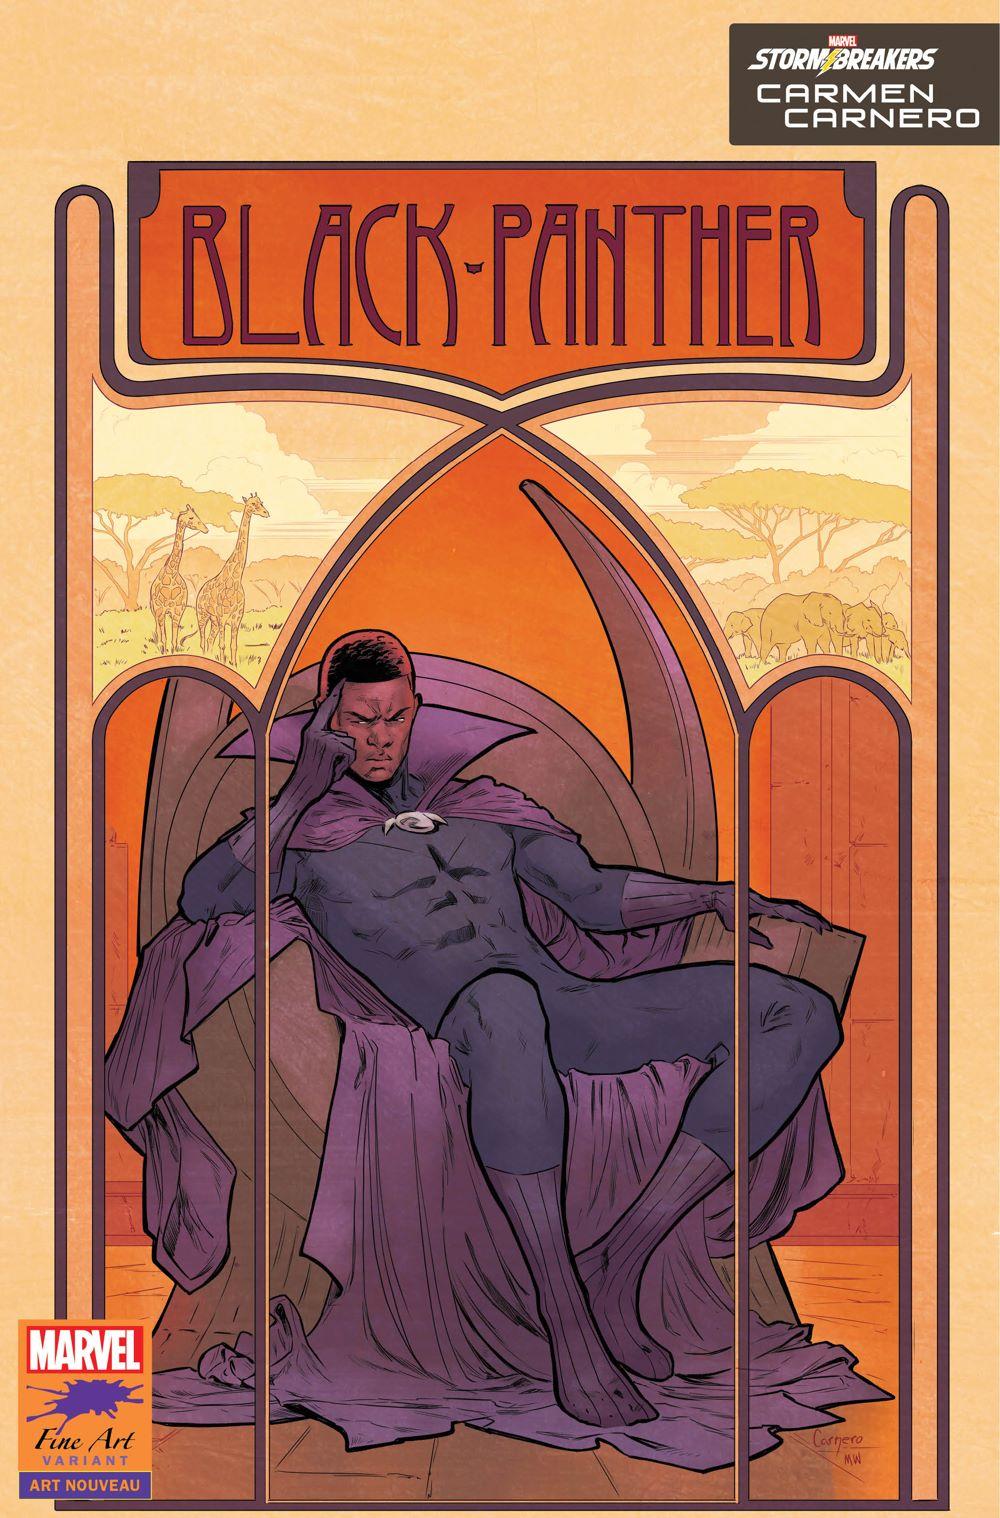 BLAP25_FINEART_CARNERO Marvel's Stormbreakers to create BLACK PANTHER Fine Art variants